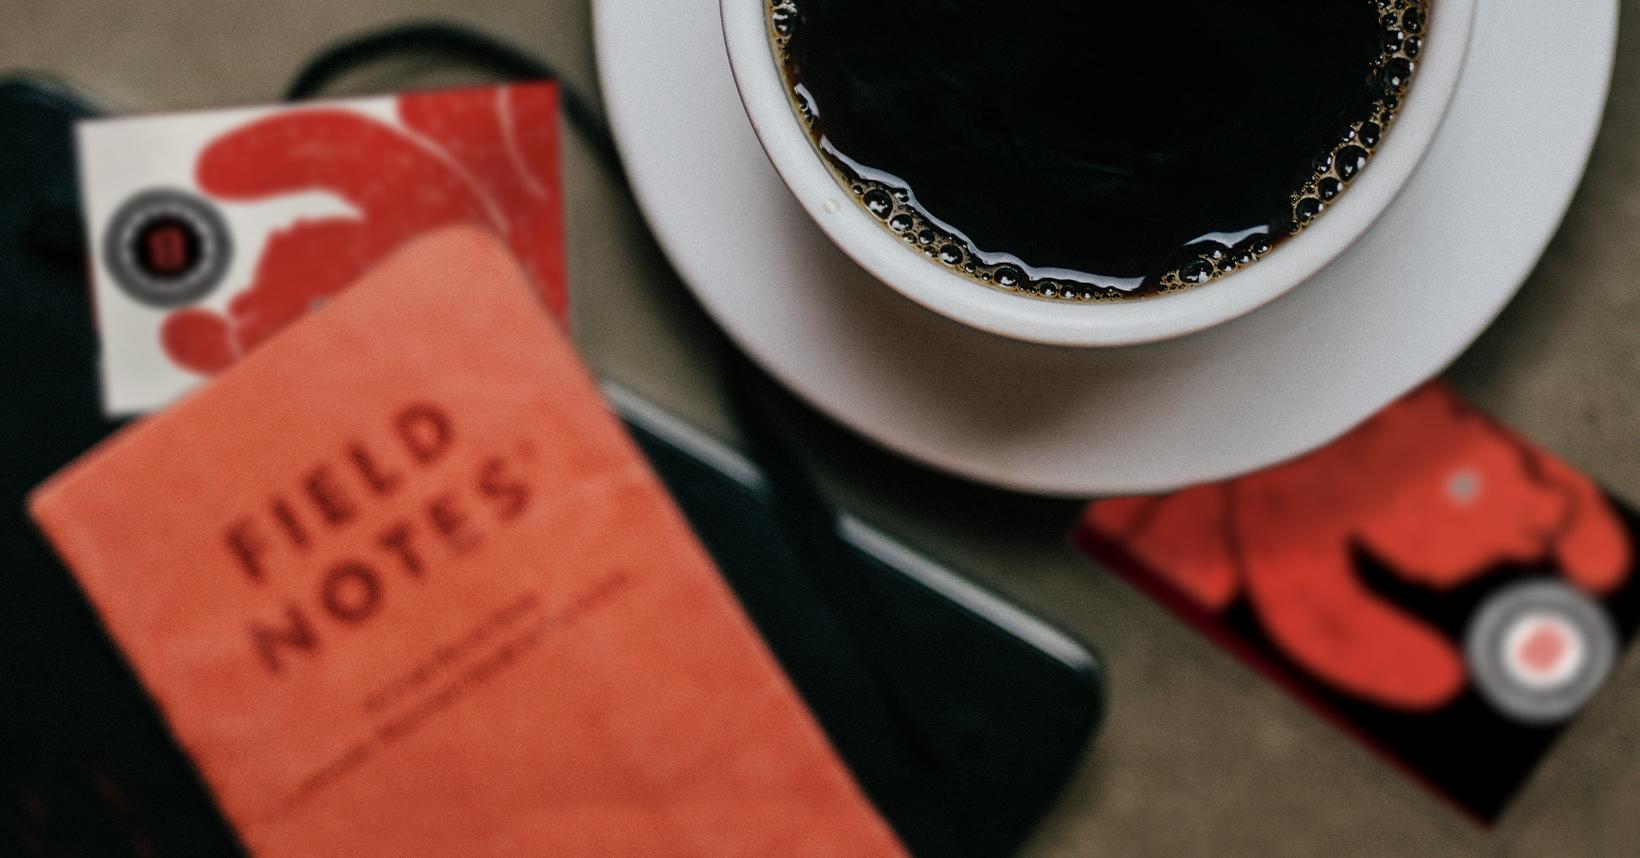 BnB_Composites_Coffee